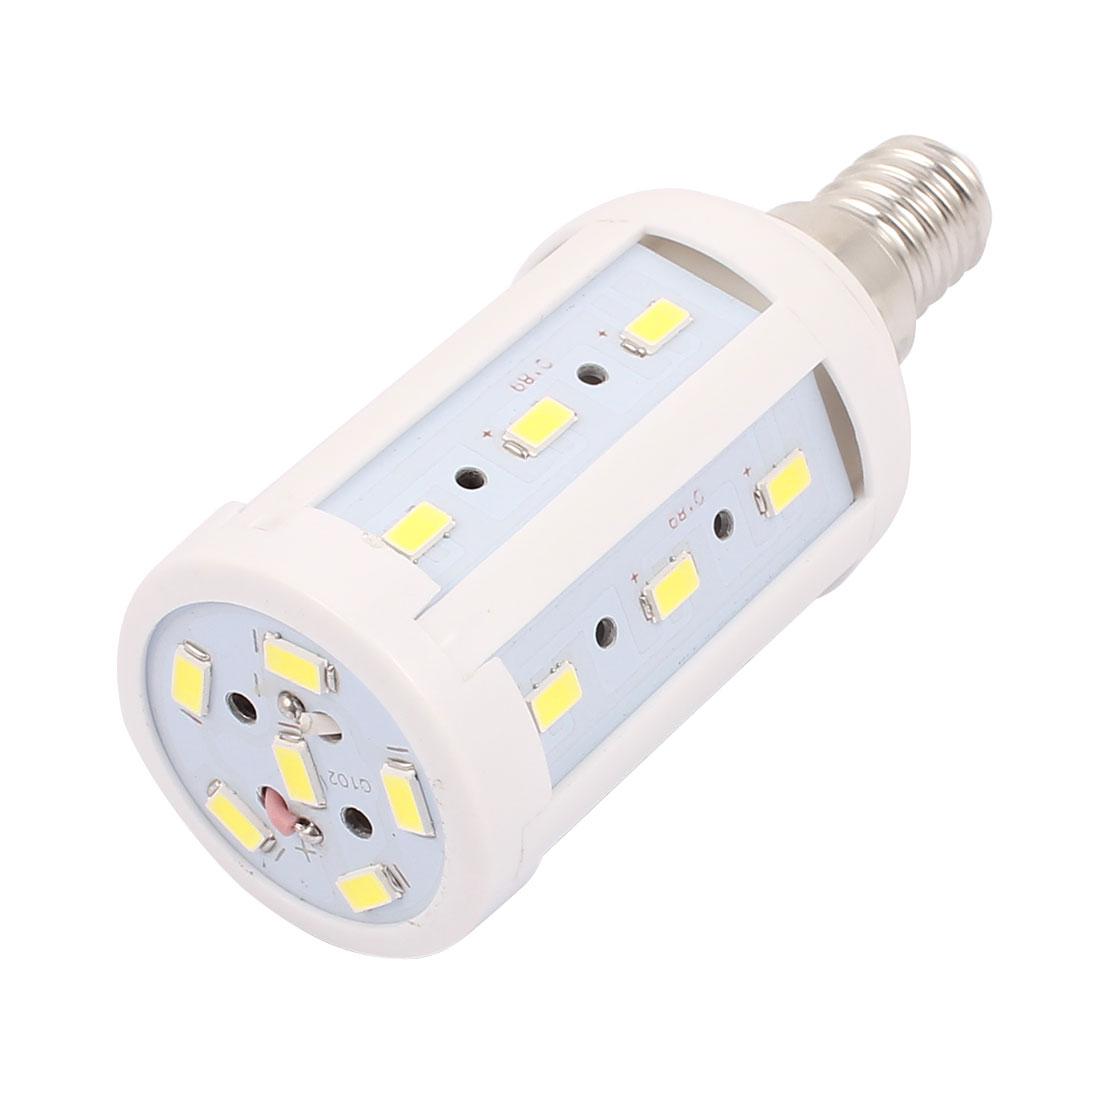 AC 85-265V 5W 5730SMD LED E14 Energy Saving Corn Light Bulb Lamp Pure White